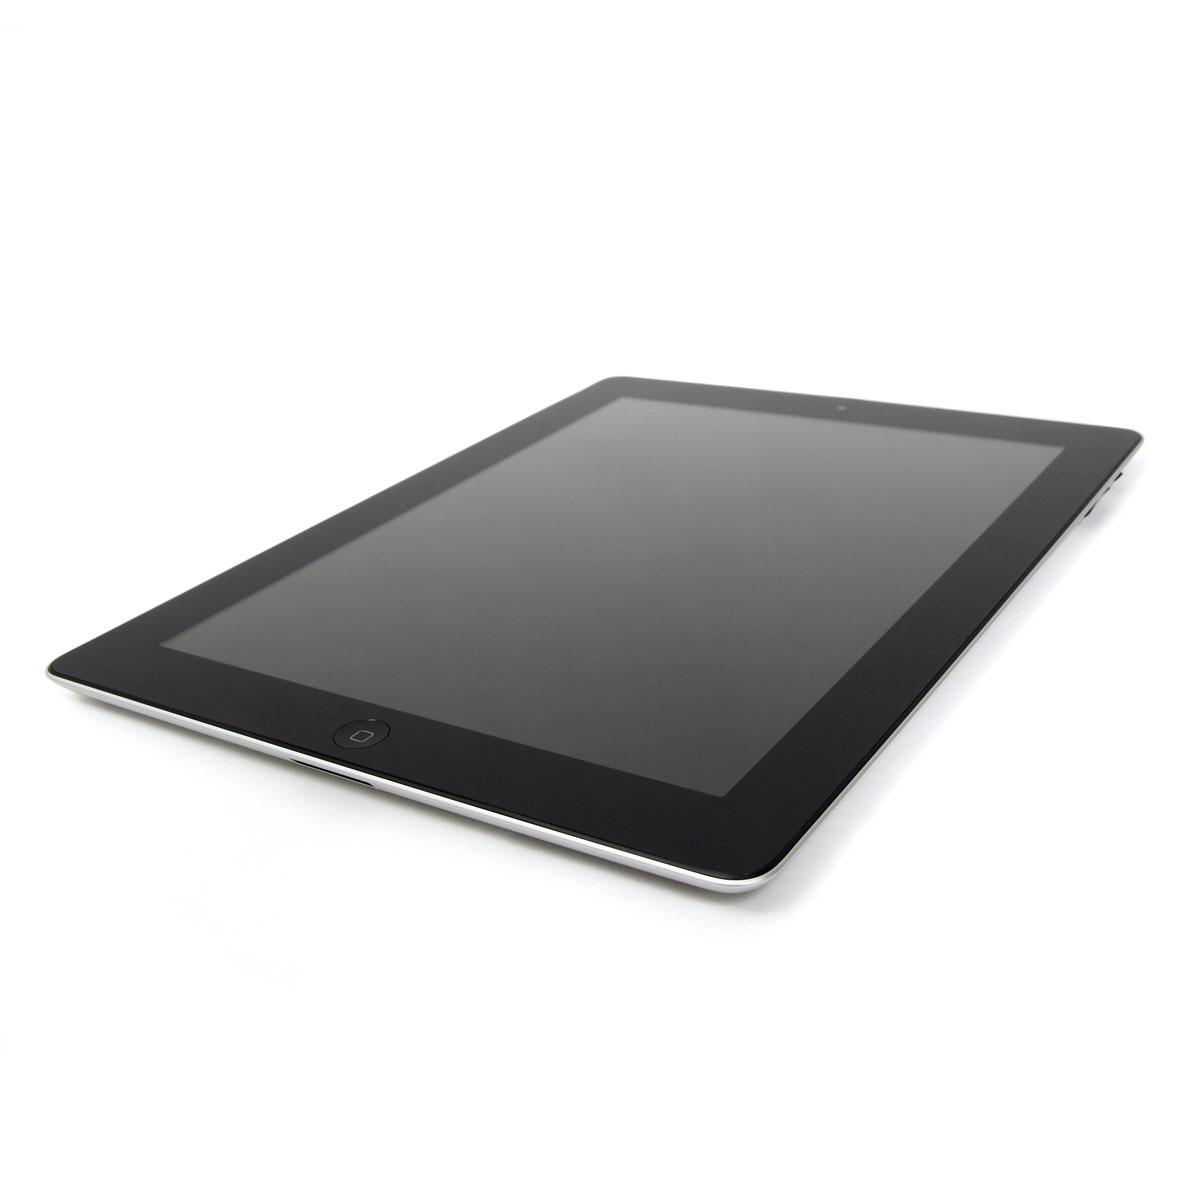 "Tablette tactile Apple iPad 2 Wi-Fi + 3G 32 Go Noir Tablette Internet - Apple A5 1 GHz 512 Mo 32 Go 9.7"" LED tactile Wi-Fi N/Bluetooth/3G Webcam iOS 4"